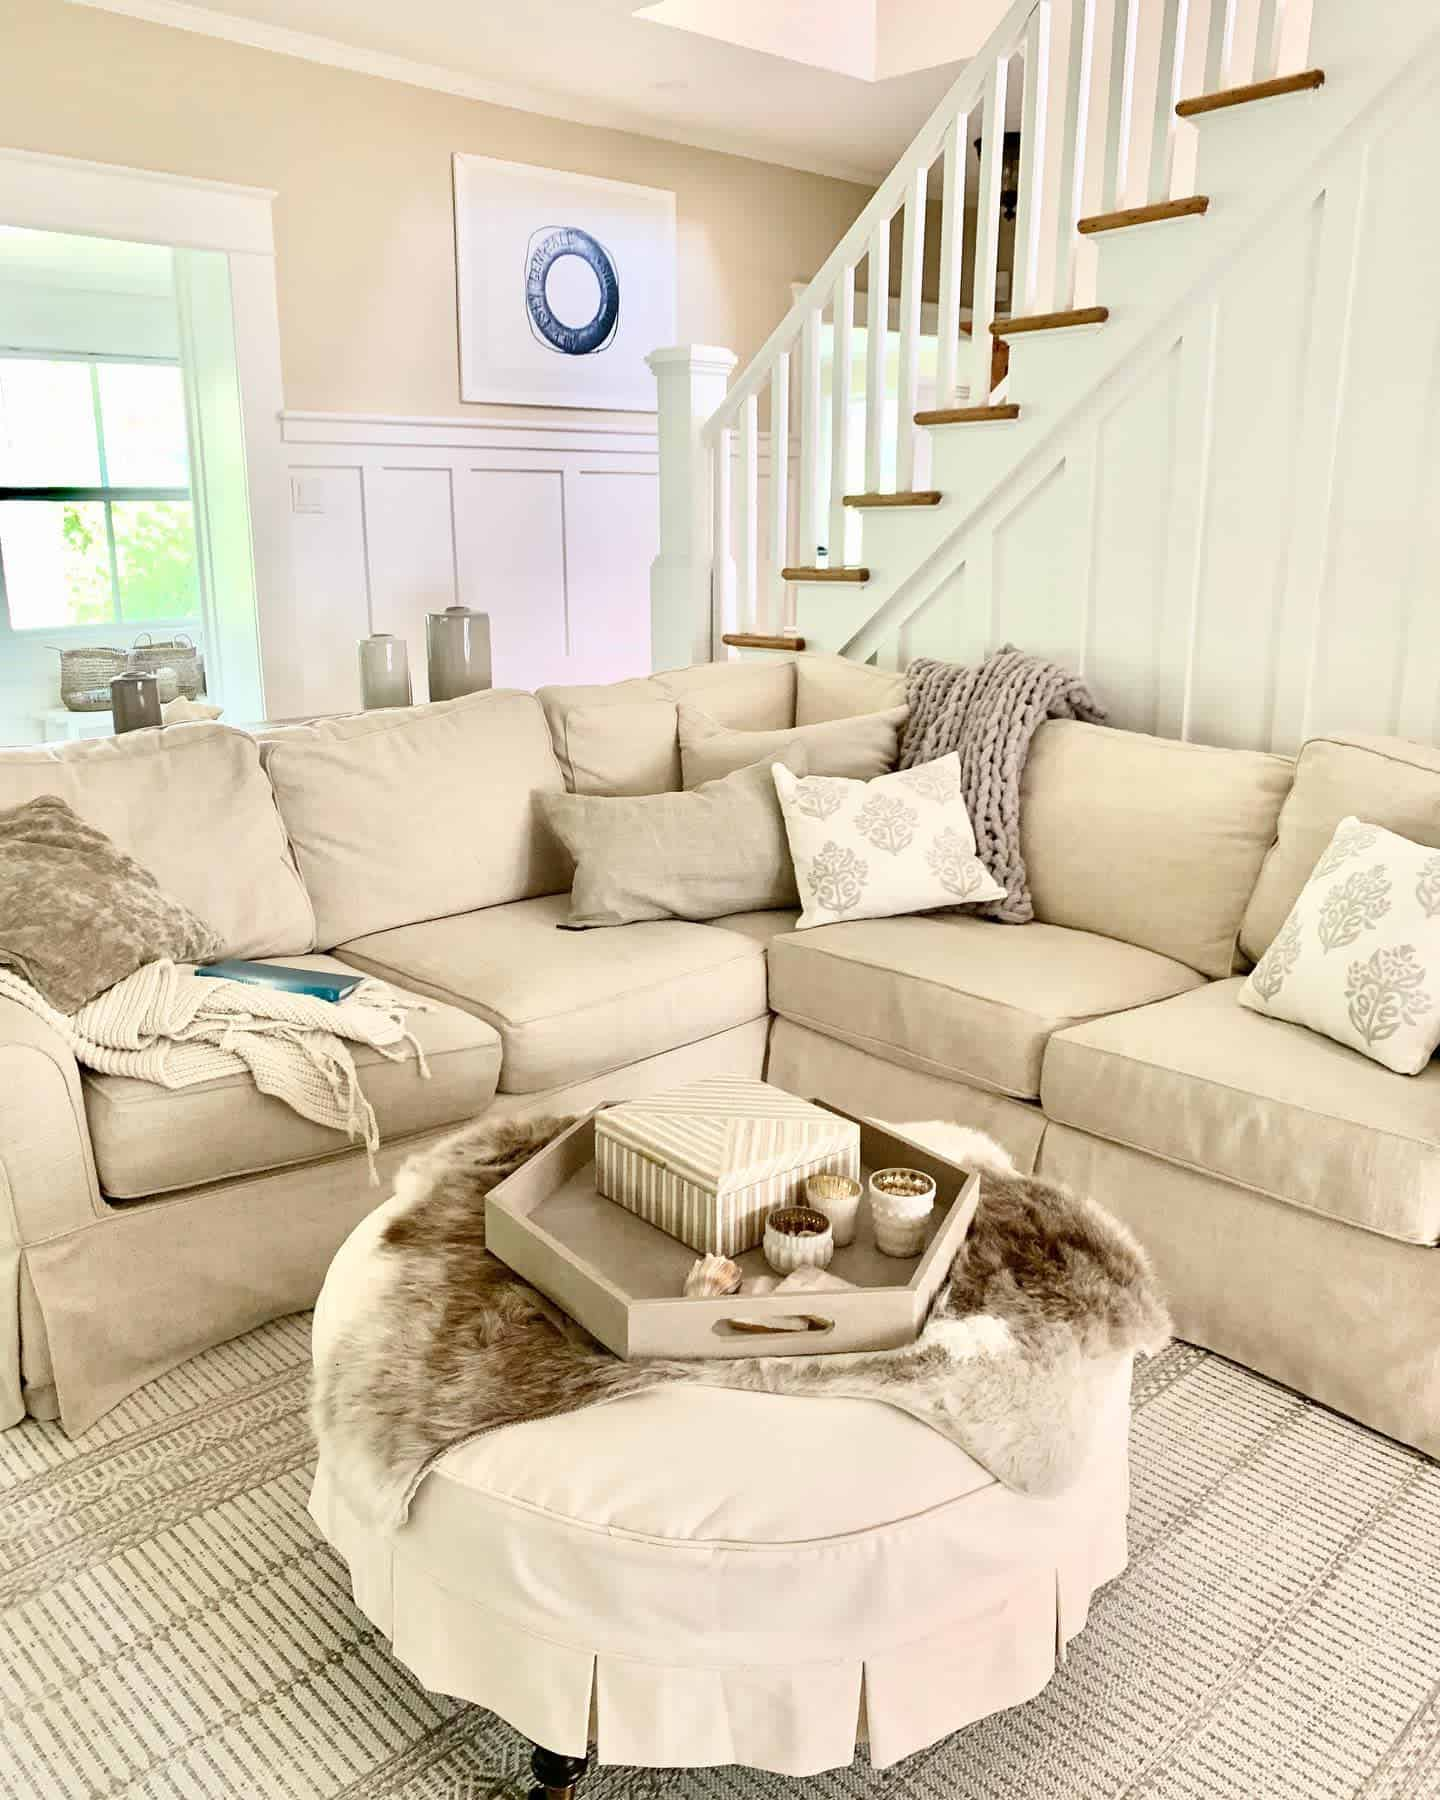 the 60 best farmhouse living room ideas interior design on colors for farmhouse living room id=70419